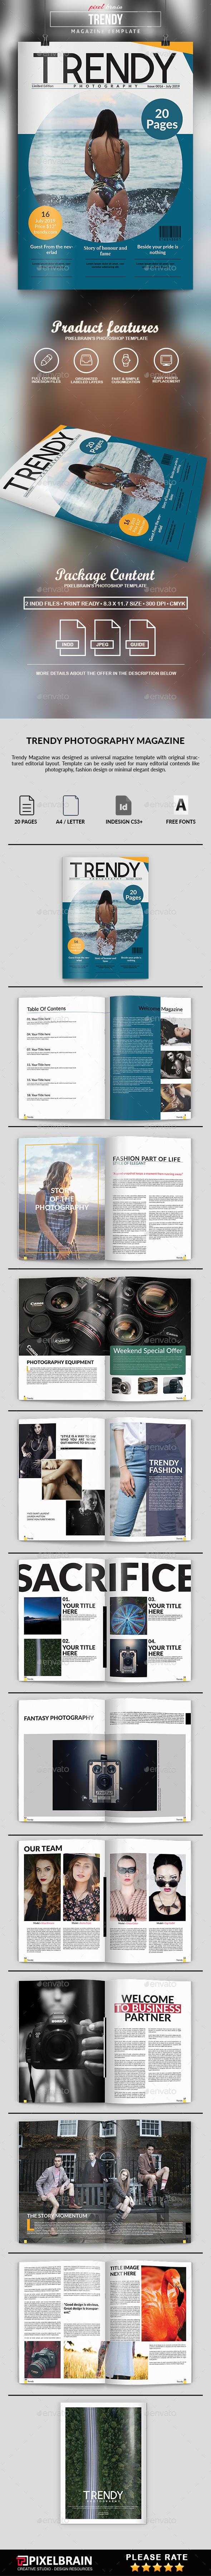 Trendy Magazine - Magazines Print Templates